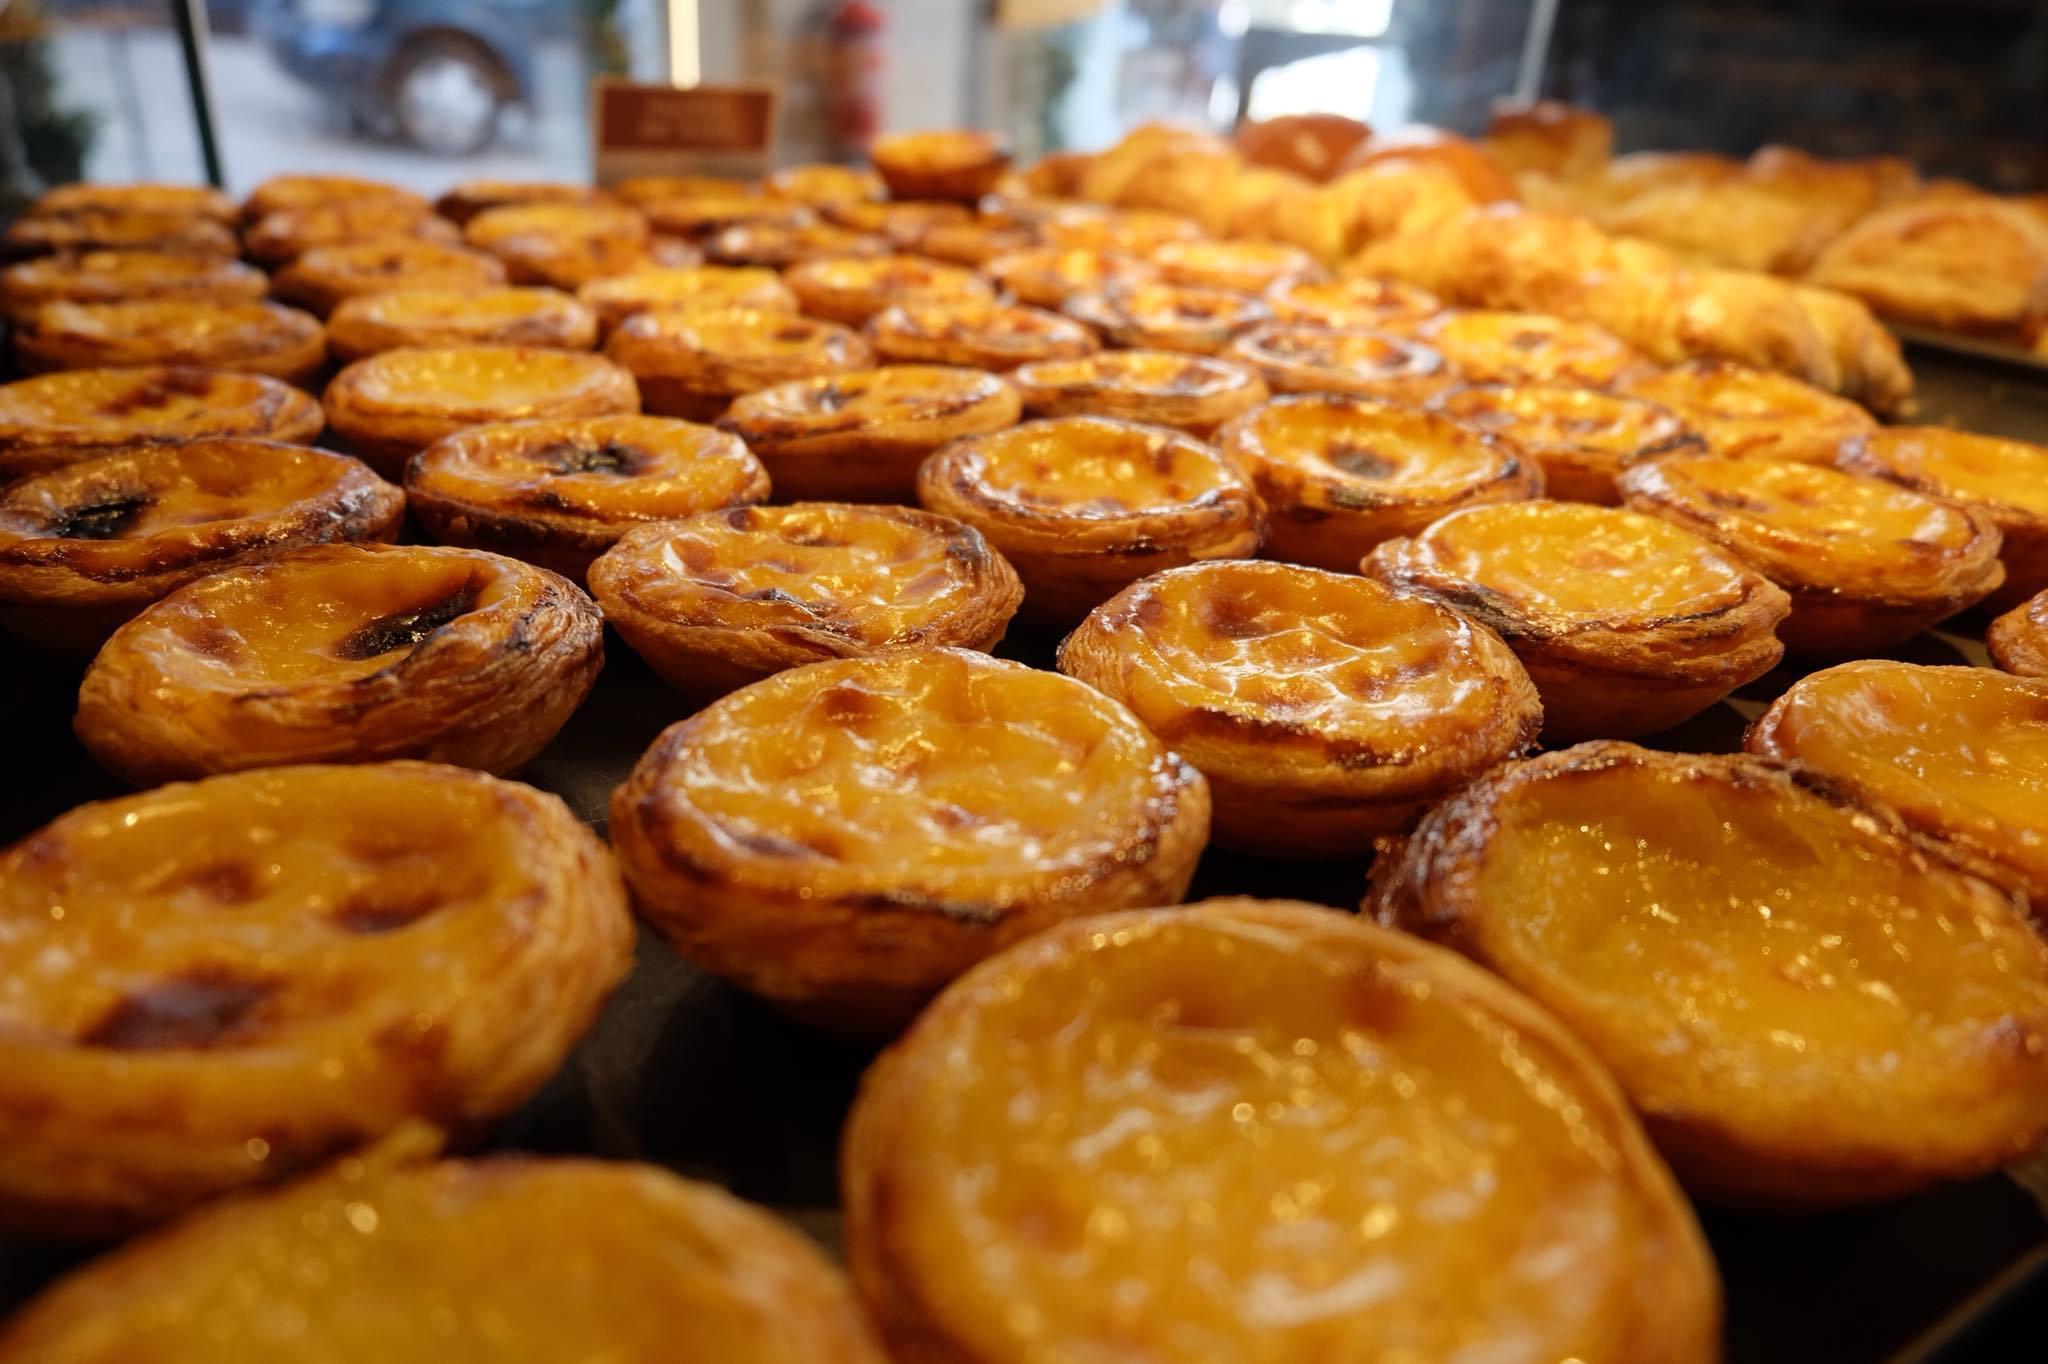 Natas from Pastelaria Alcoa - Lisbon